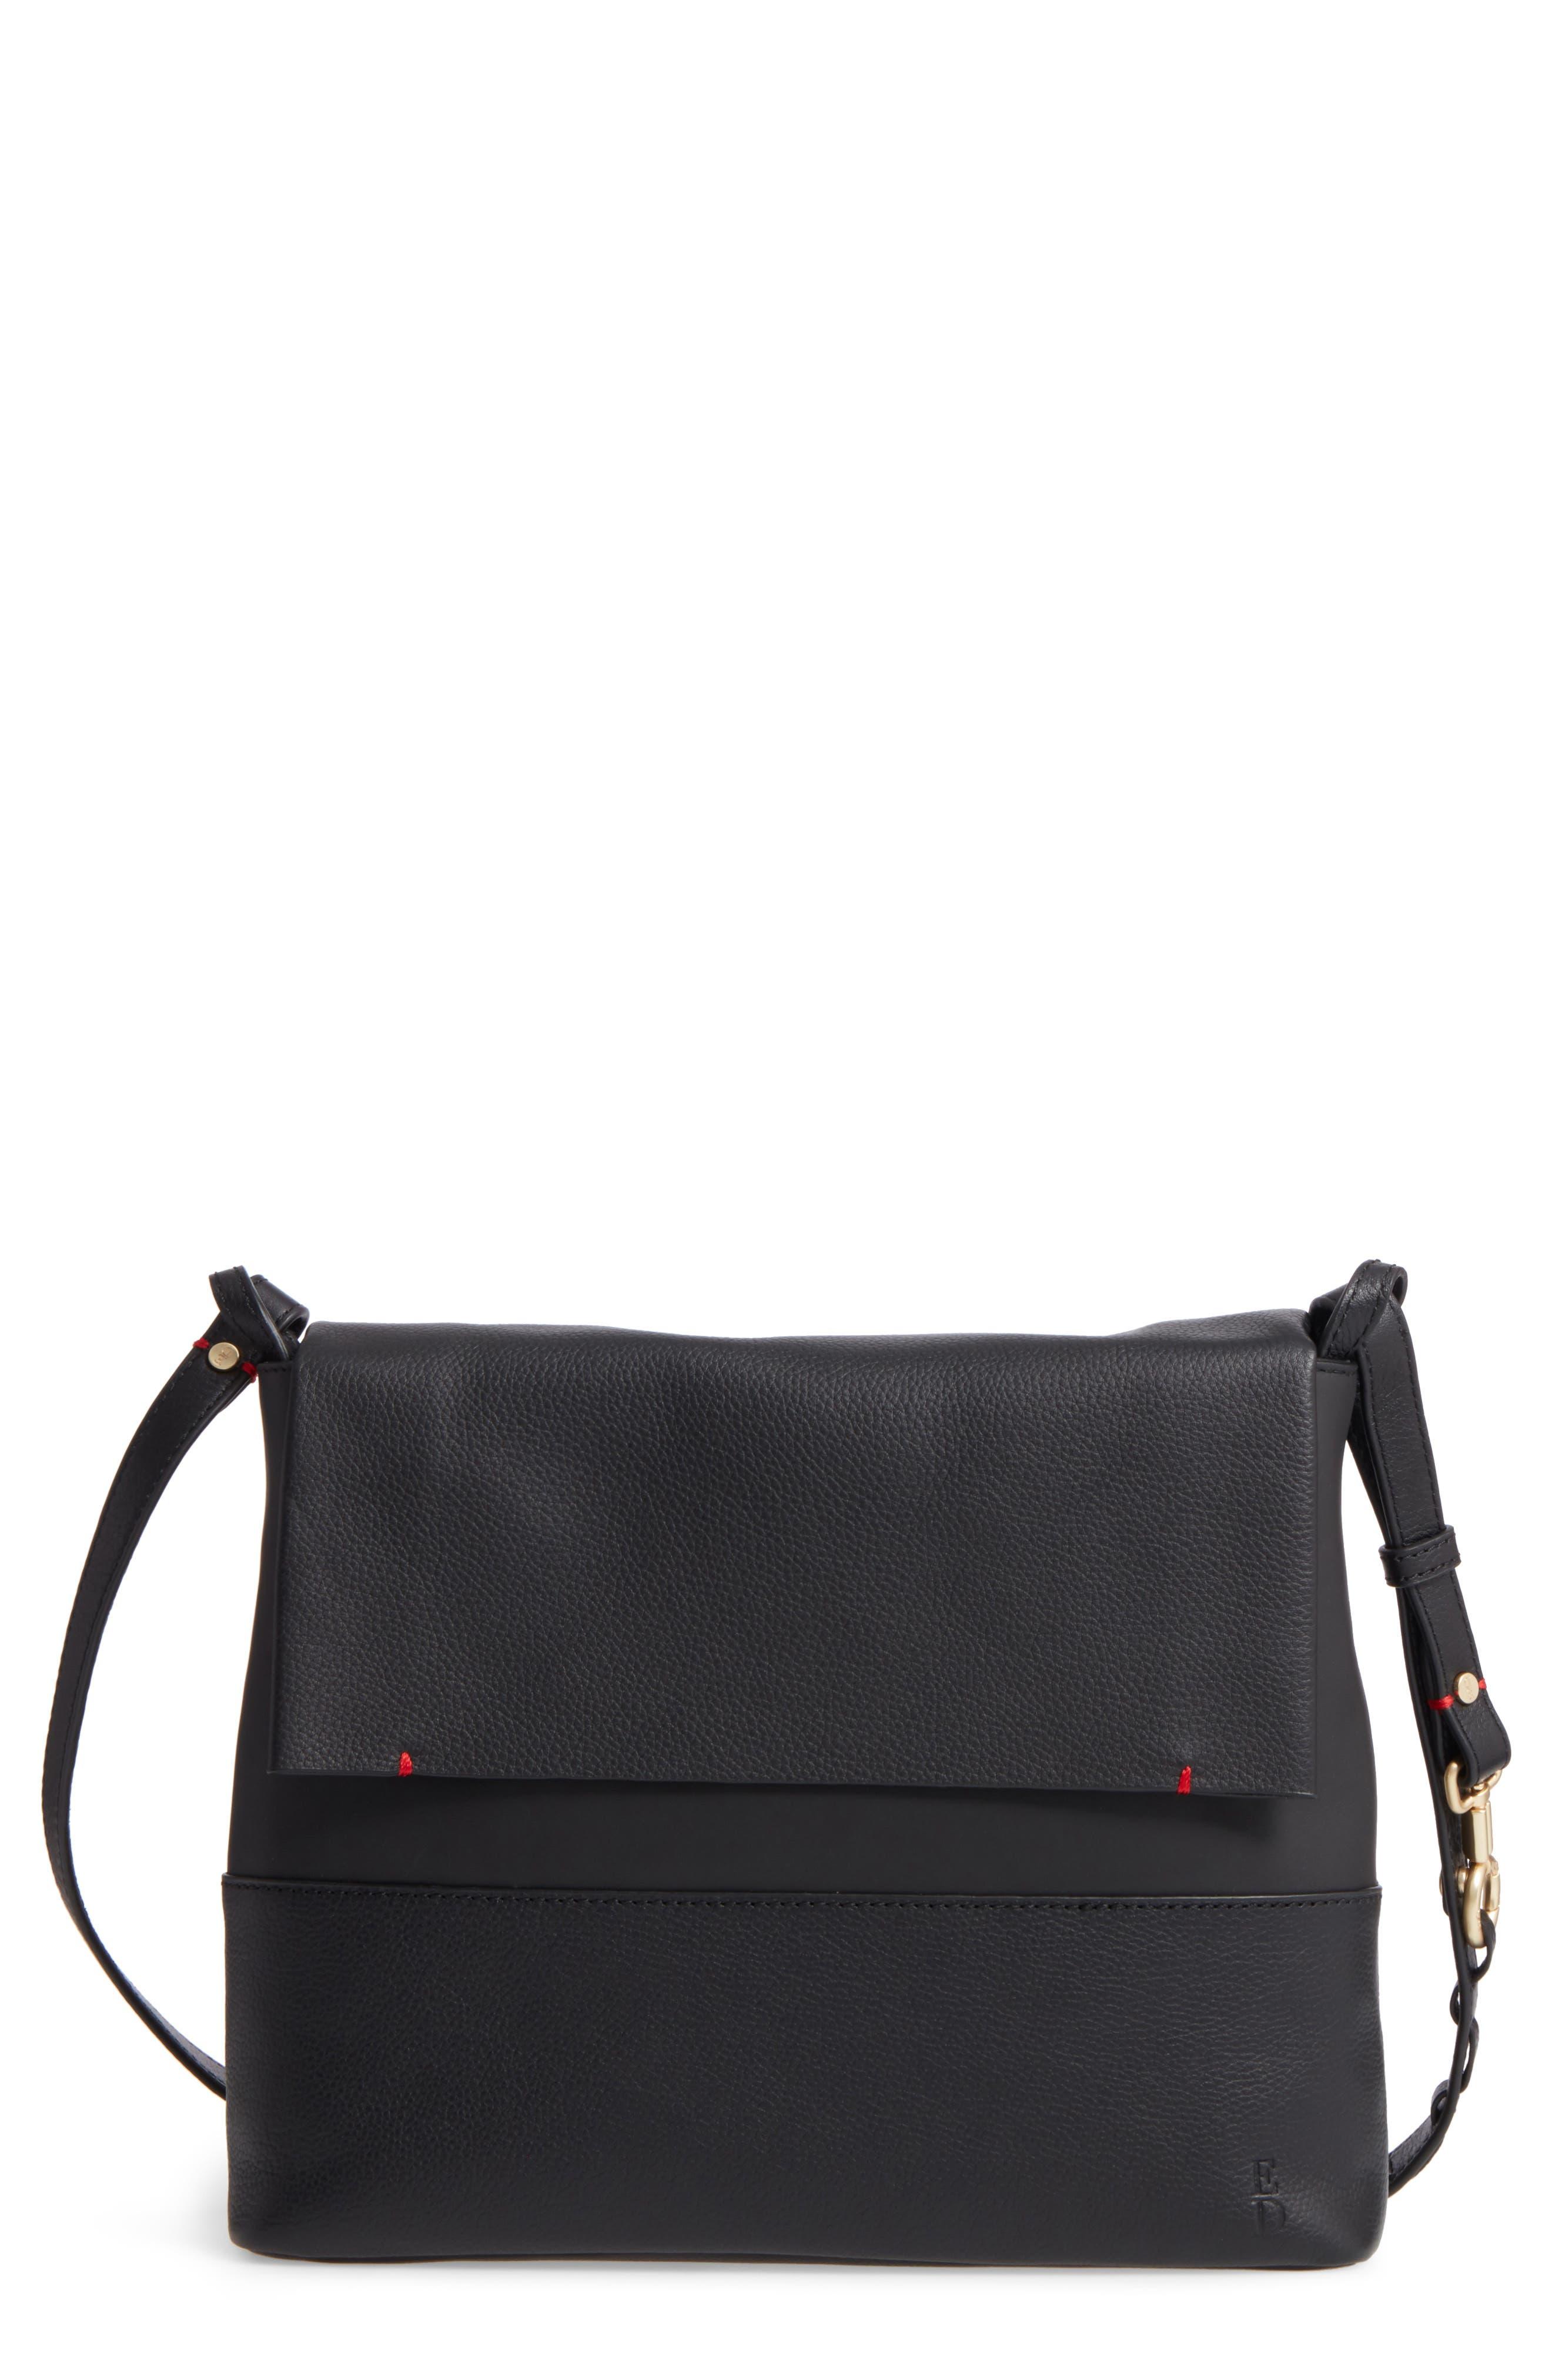 Medium Brea Crossbody Bag,                         Main,                         color, 001